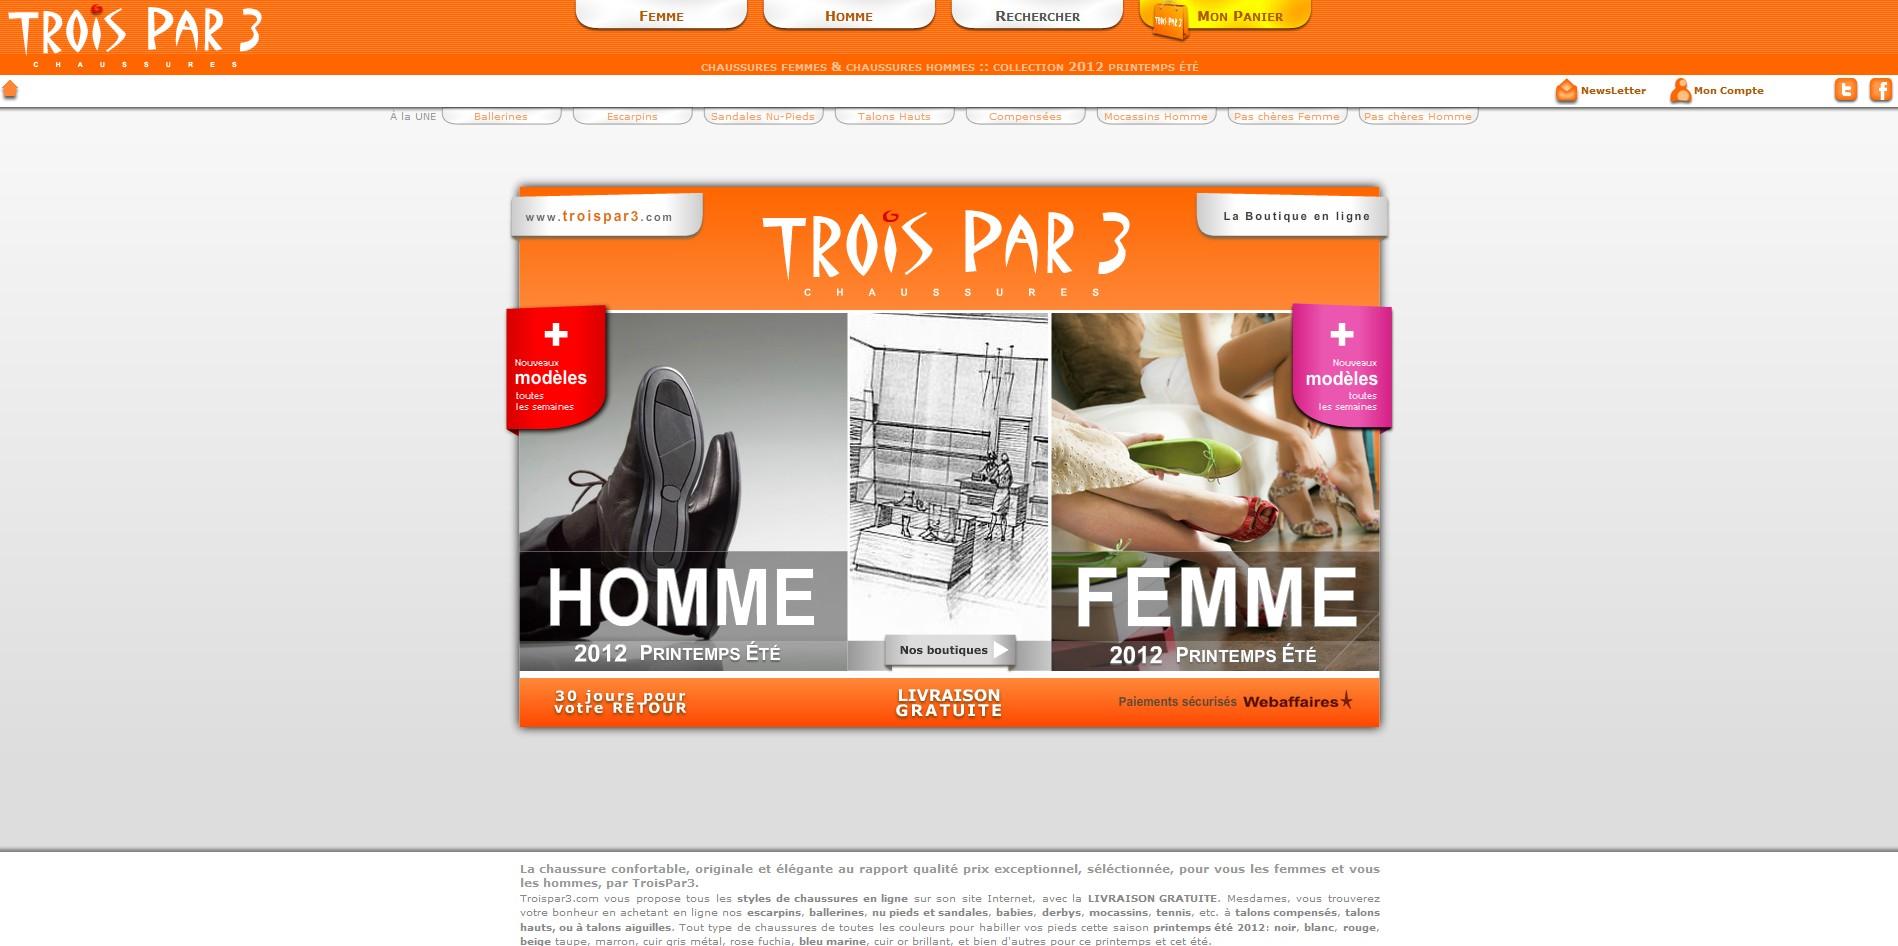 www.troispar3.com